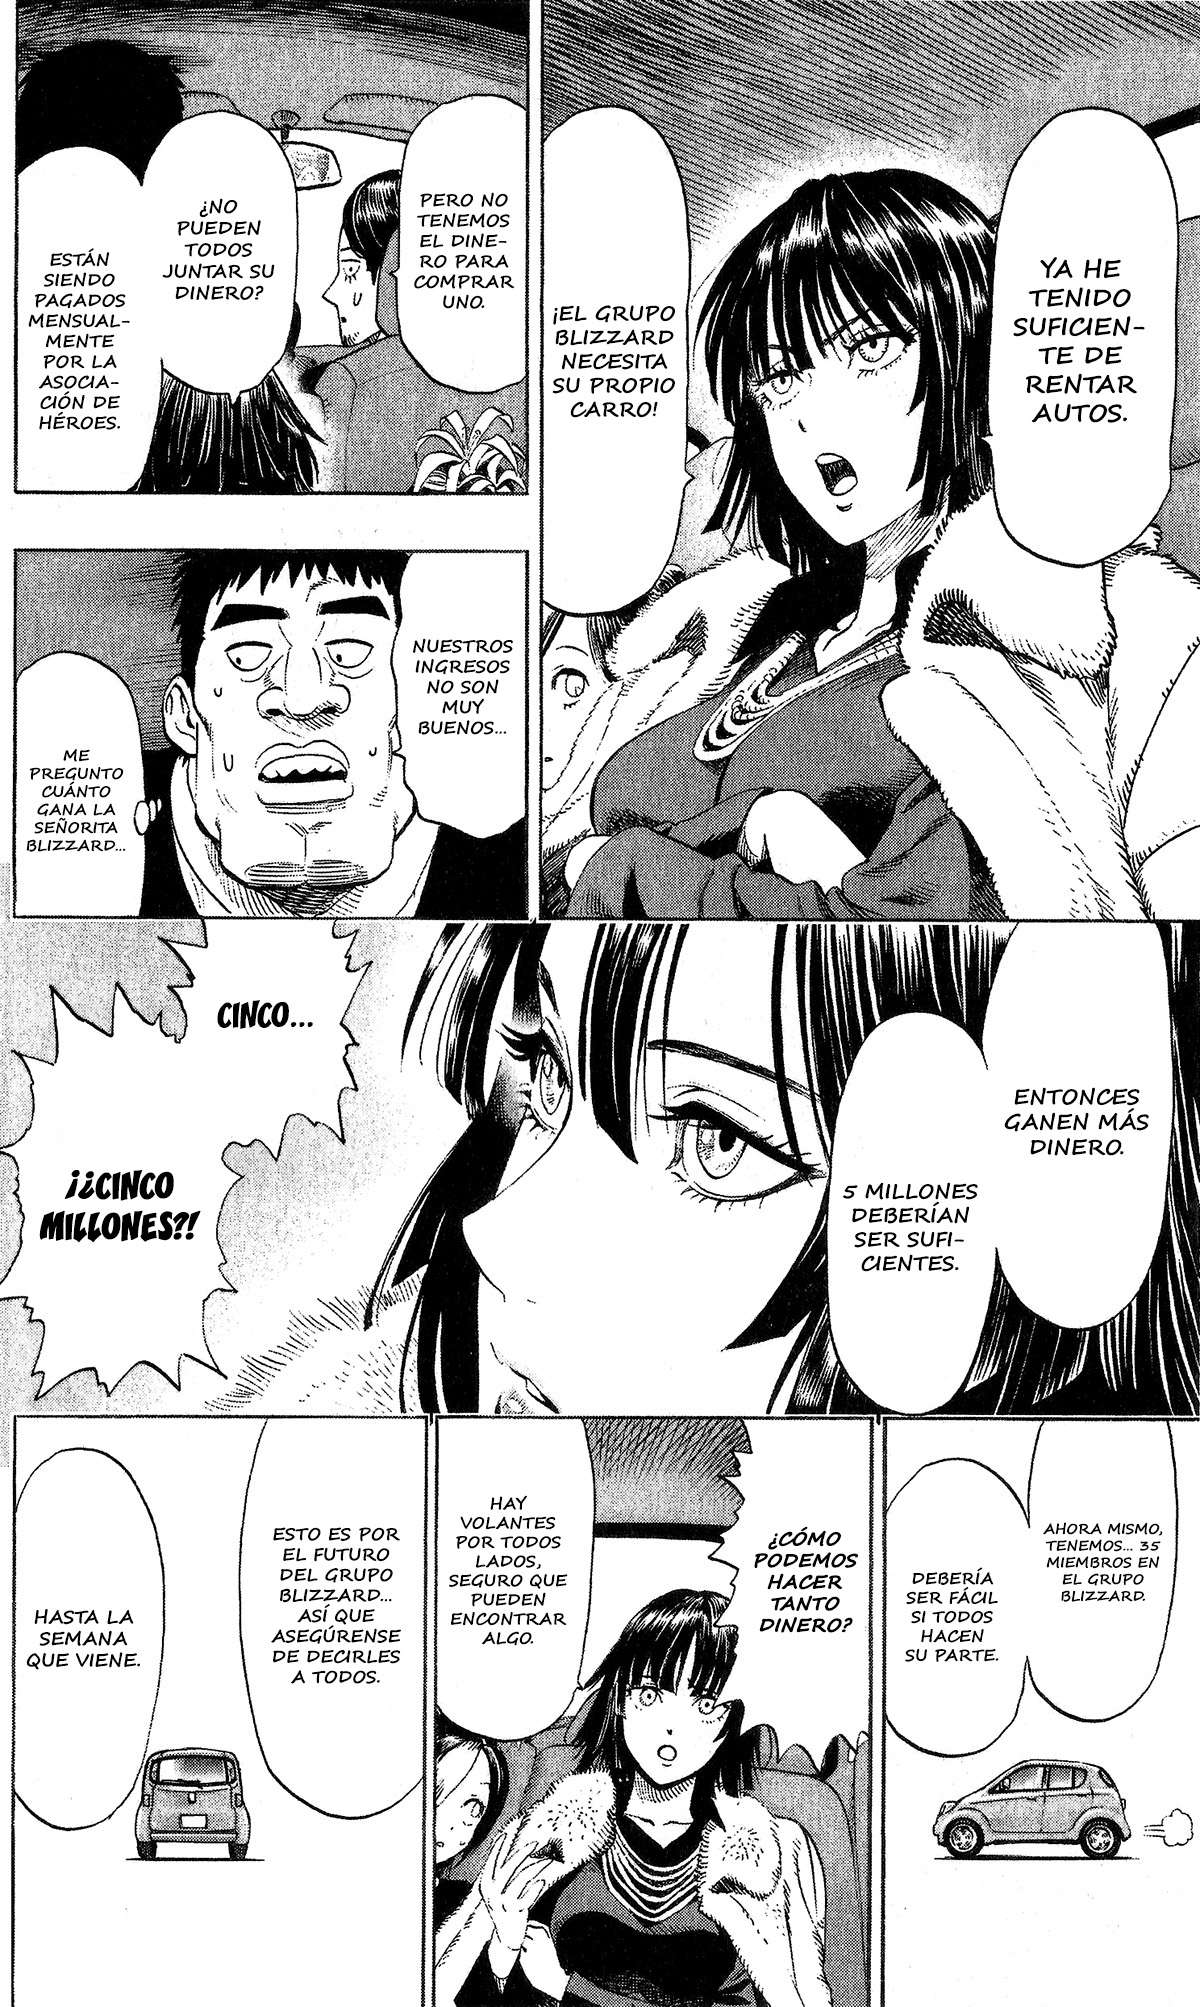 http://c5.ninemanga.com/es_manga/21/14805/414693/586406bbb76b6baac45c43a81ec2e35c.jpg Page 3